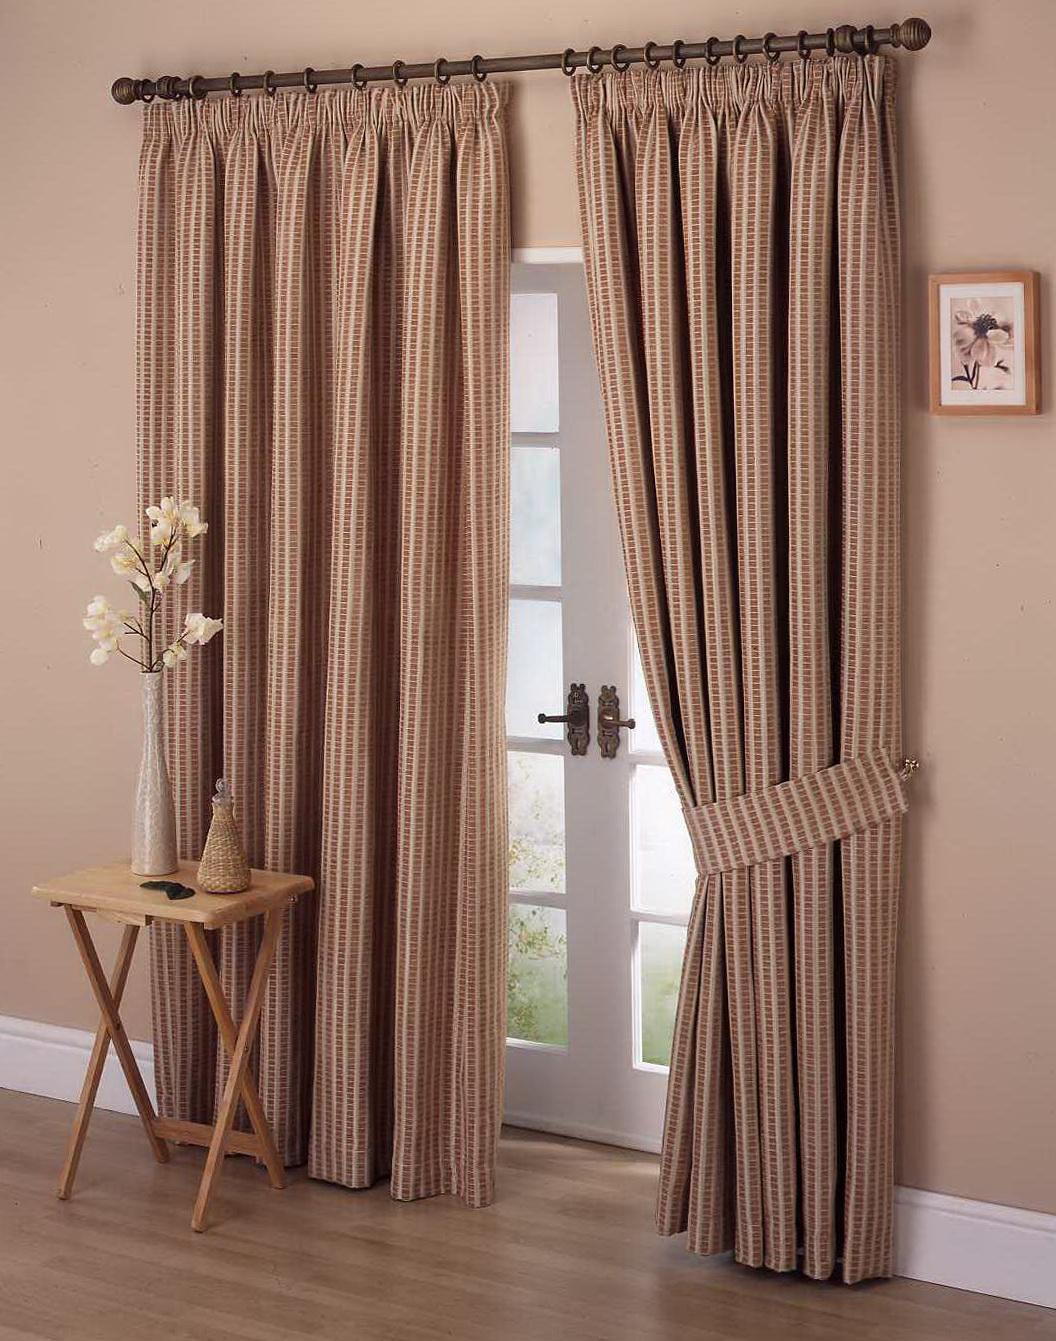 Curtain Design Ideas 2014